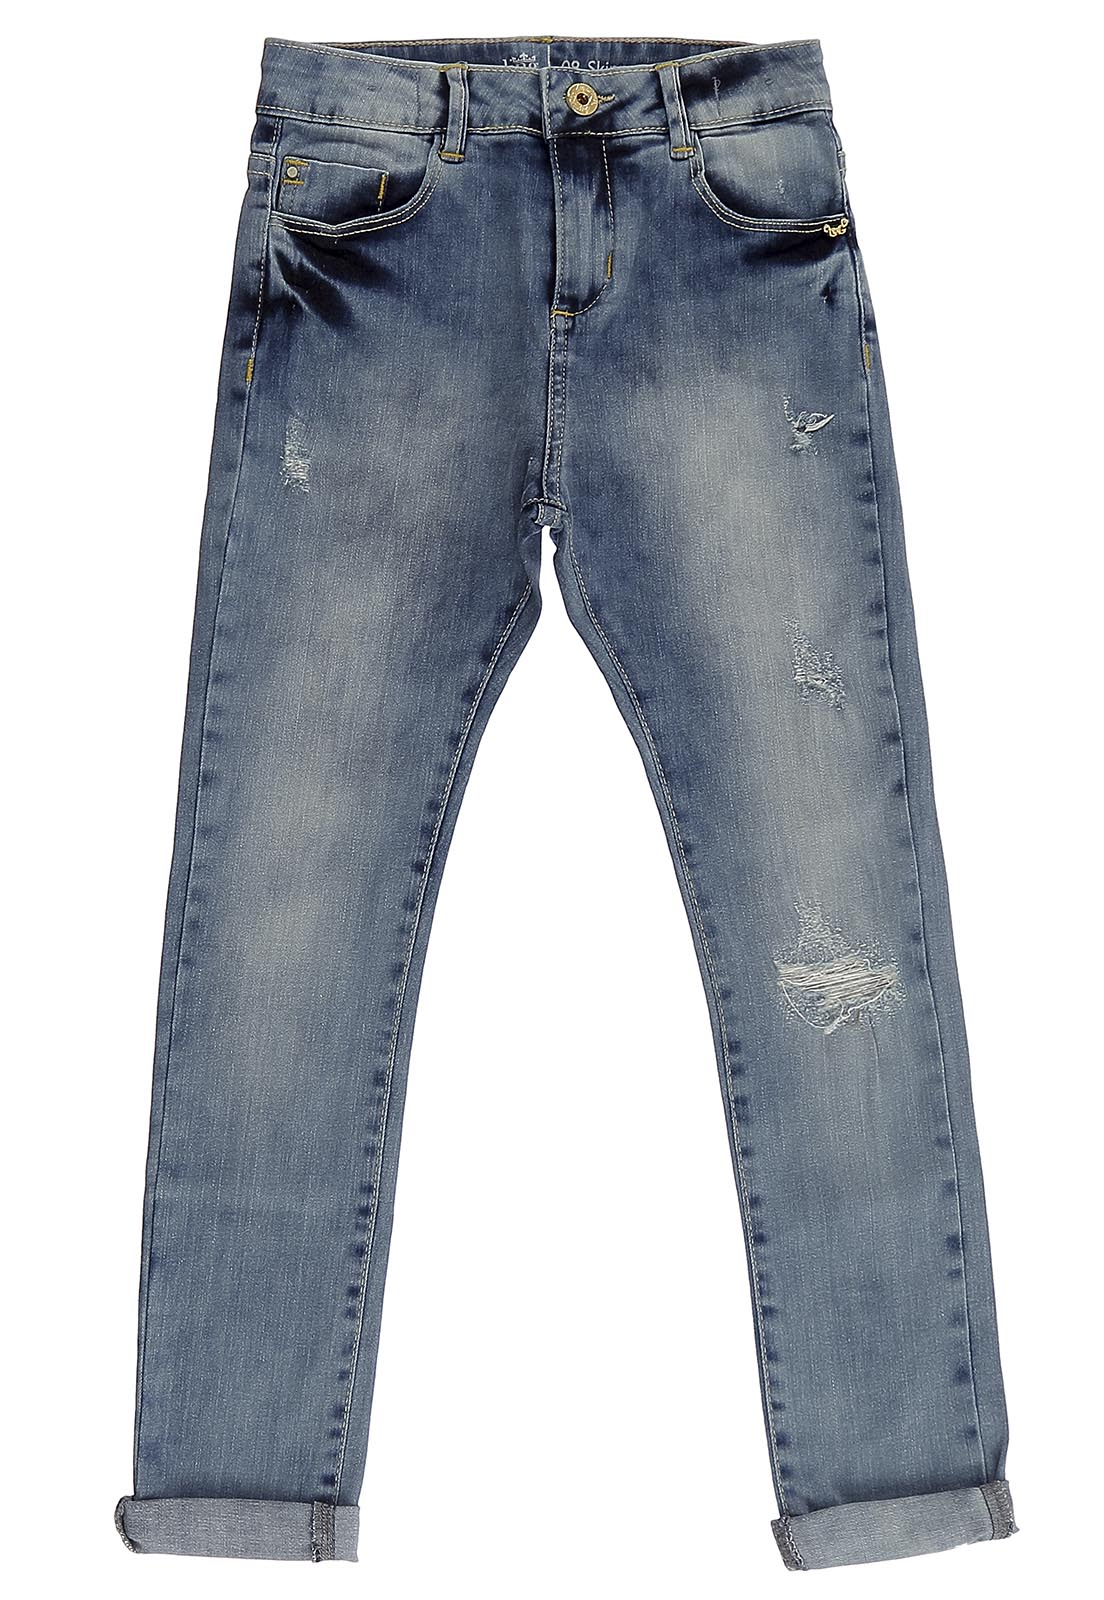 Calça Crawling Jeans Feminina Skinny